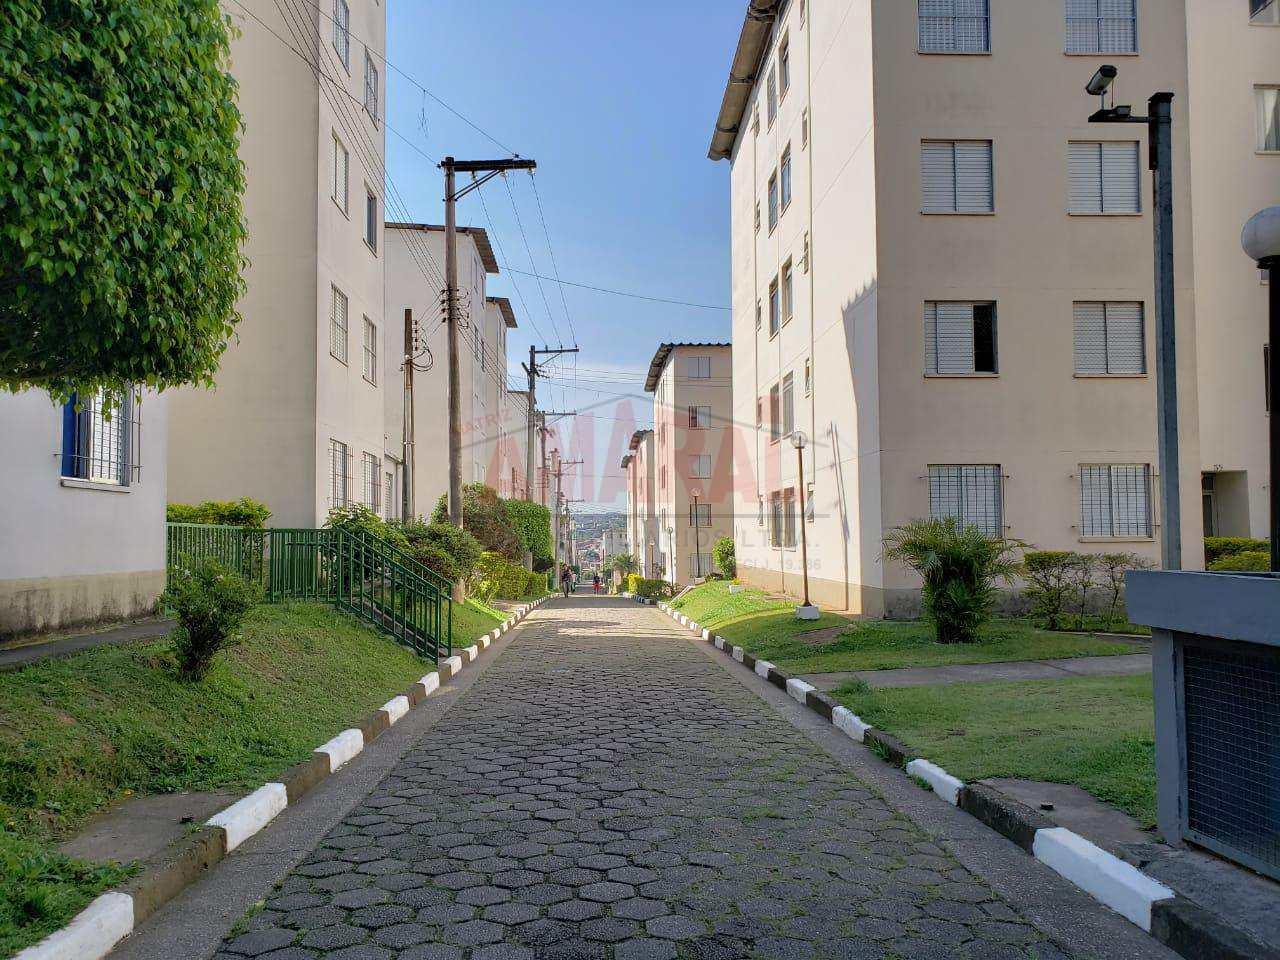 Apartamento com 2 dorms, Cidade Satélite Santa Bárbara, São Paulo - R$ 170 mil, Cod: 10992